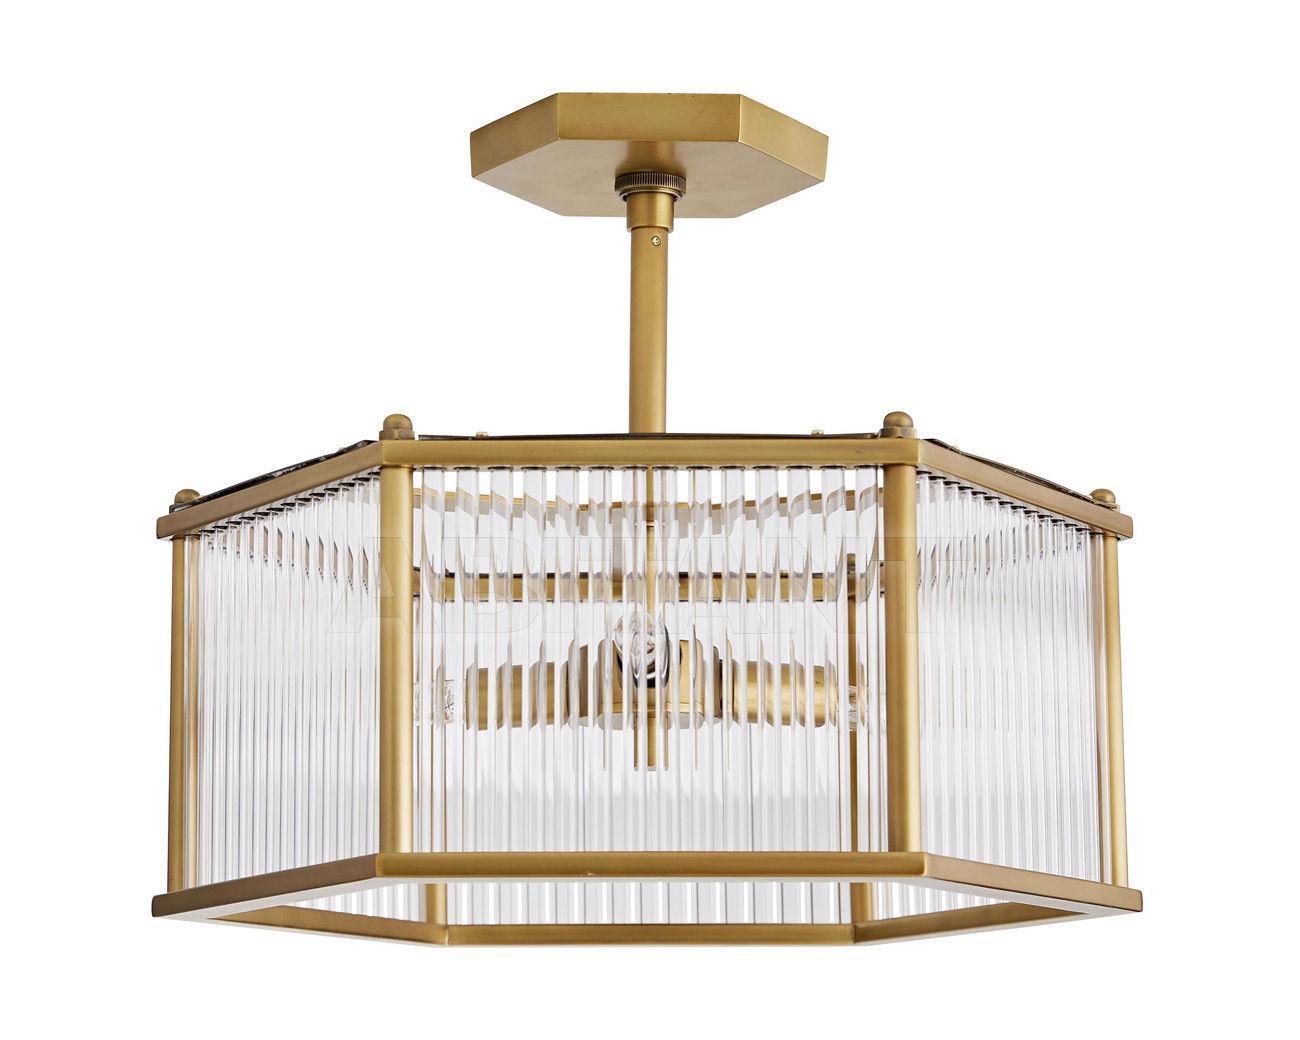 Купить Светильник Hera  Arteriors Home  LIGHTING DS49027